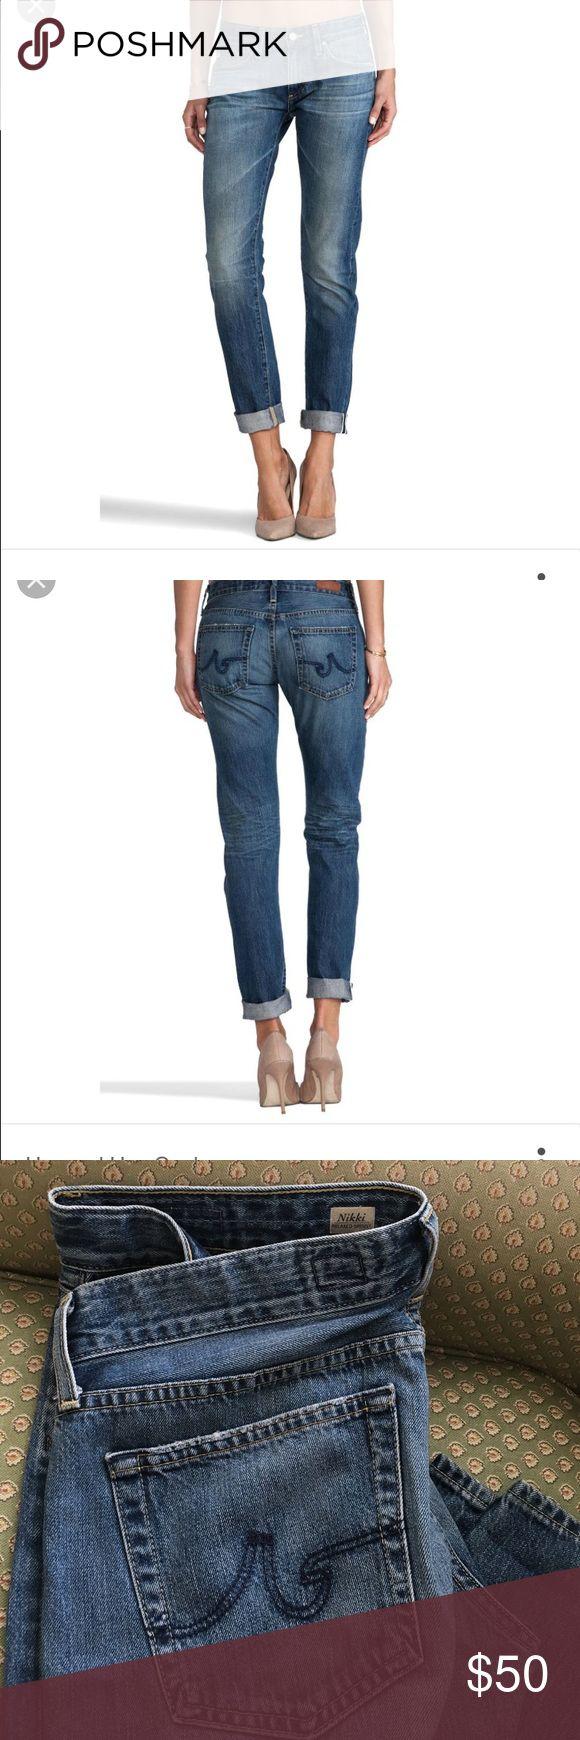 AG Nikki Relaxed slim boyfriend.  Great condition Very comfortable and stylish boyfriend jeans!  Size 30x33 AG Adriano Goldschmied Jeans Boyfriend